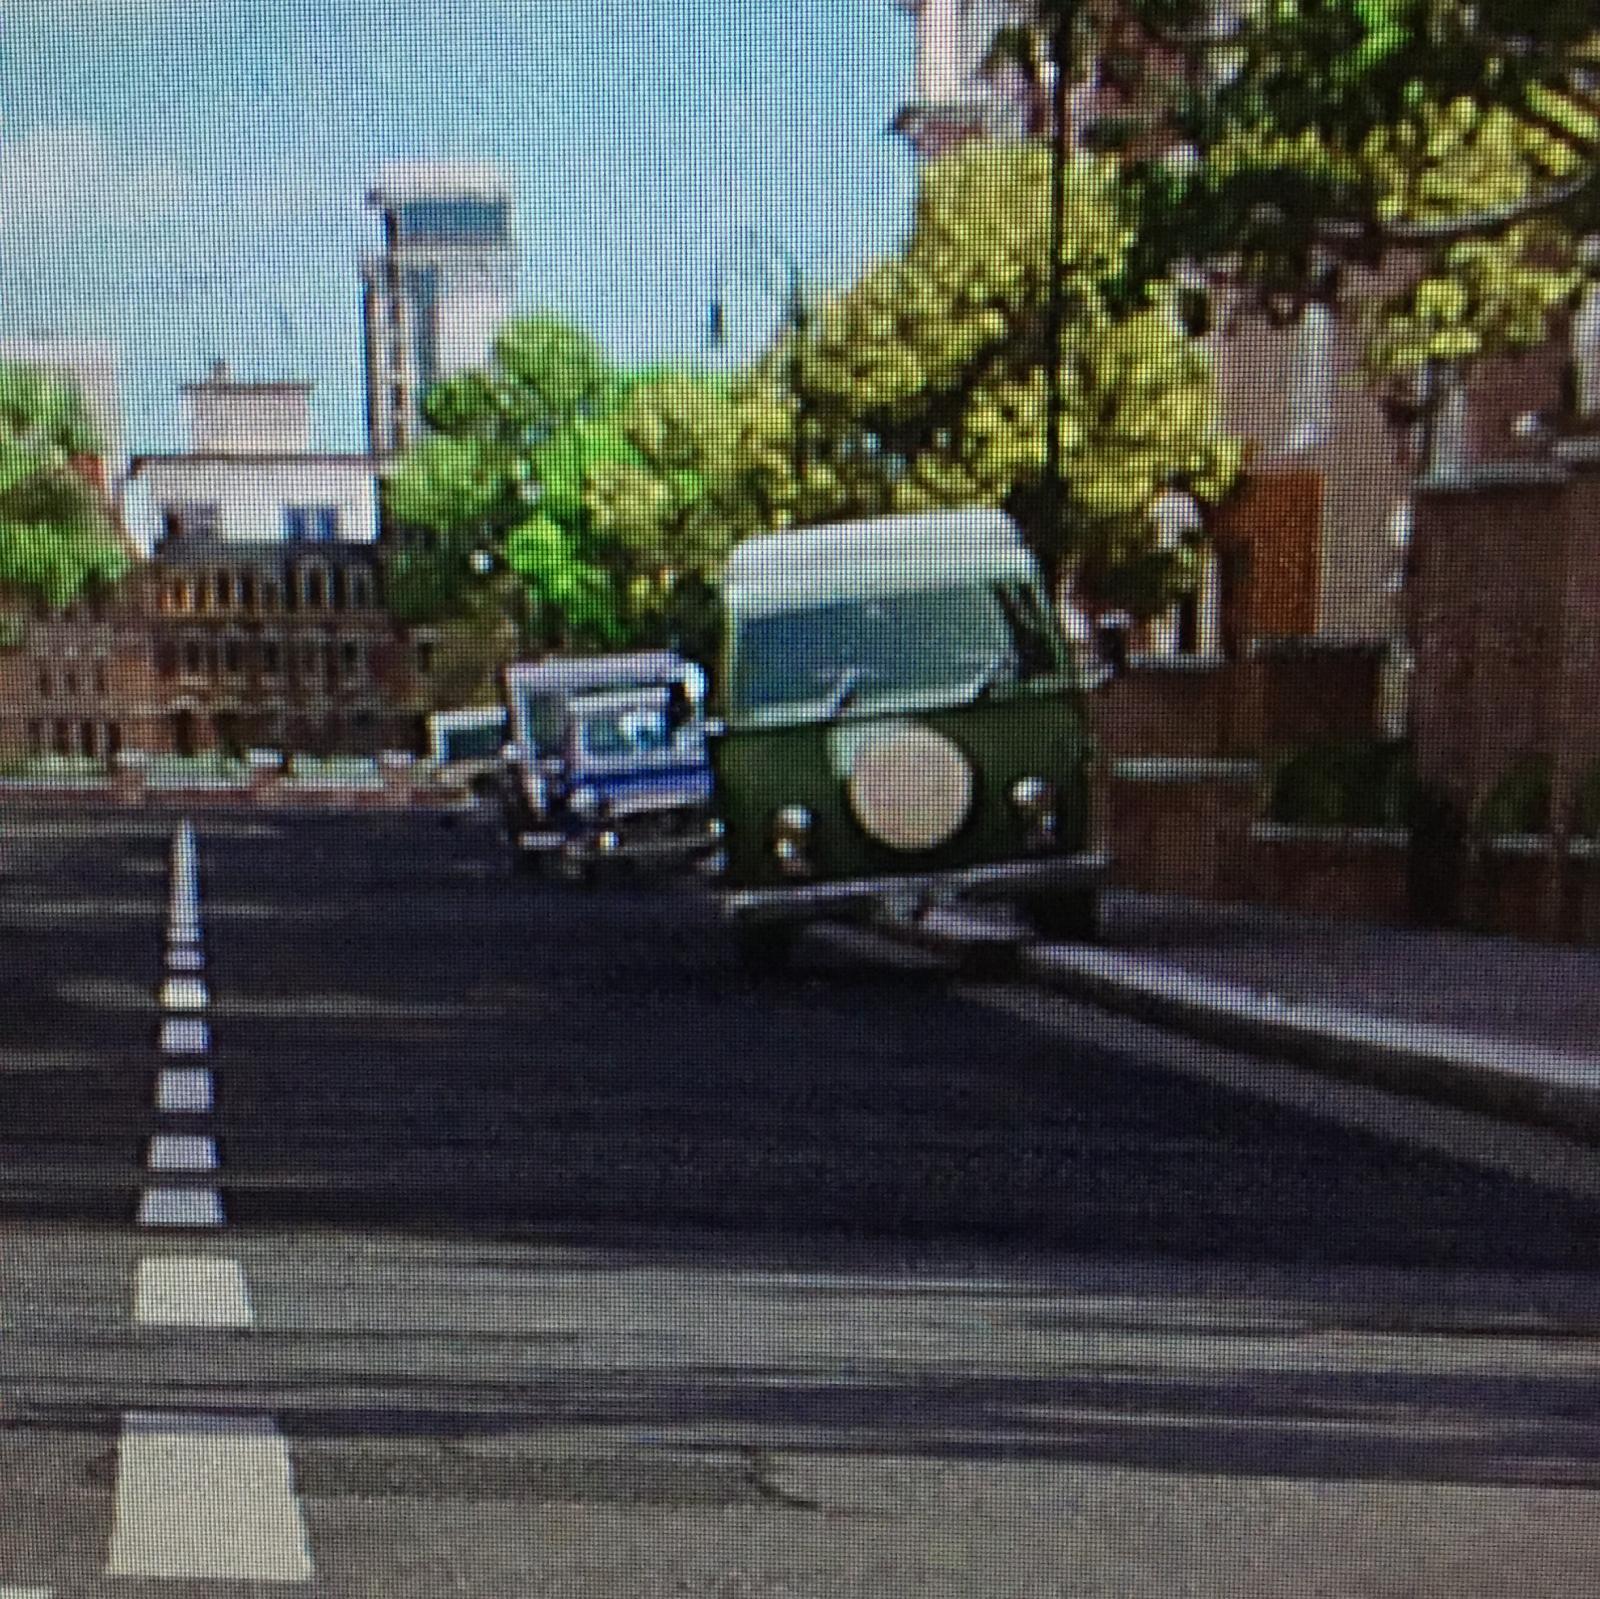 The Minions movie: Abbey Road